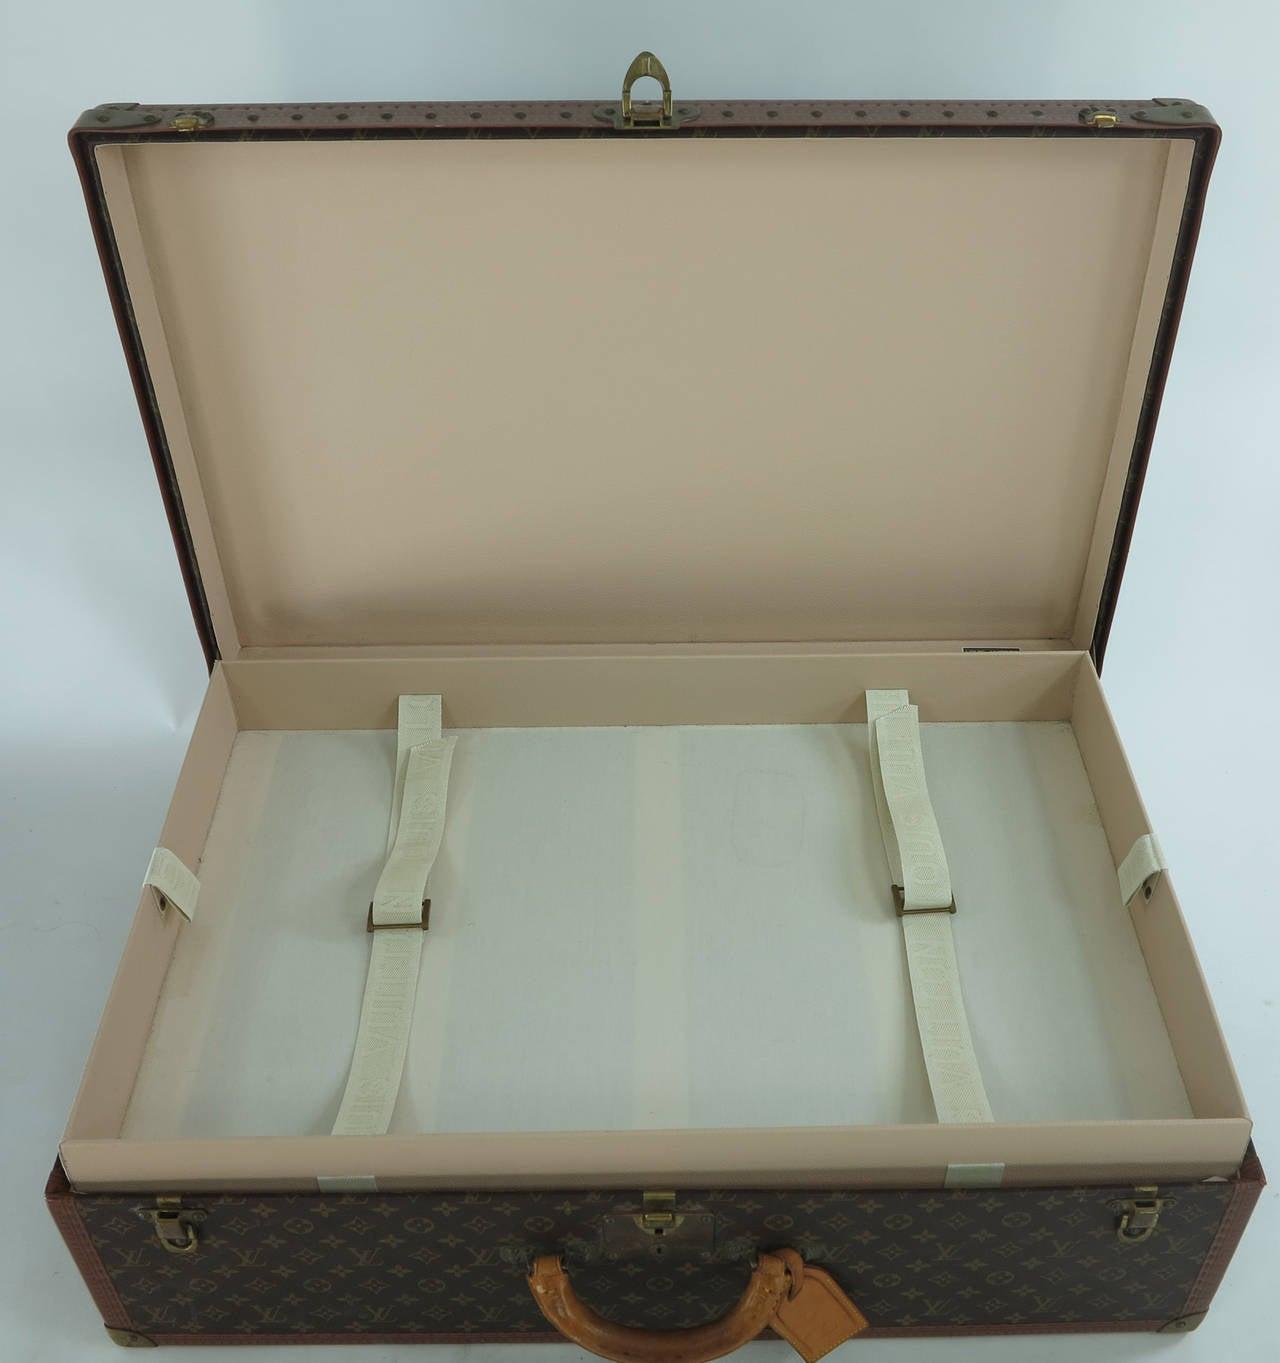 Louis Vuitton Alzar 80 monogram hardside suitcase/trunk For Sale 1